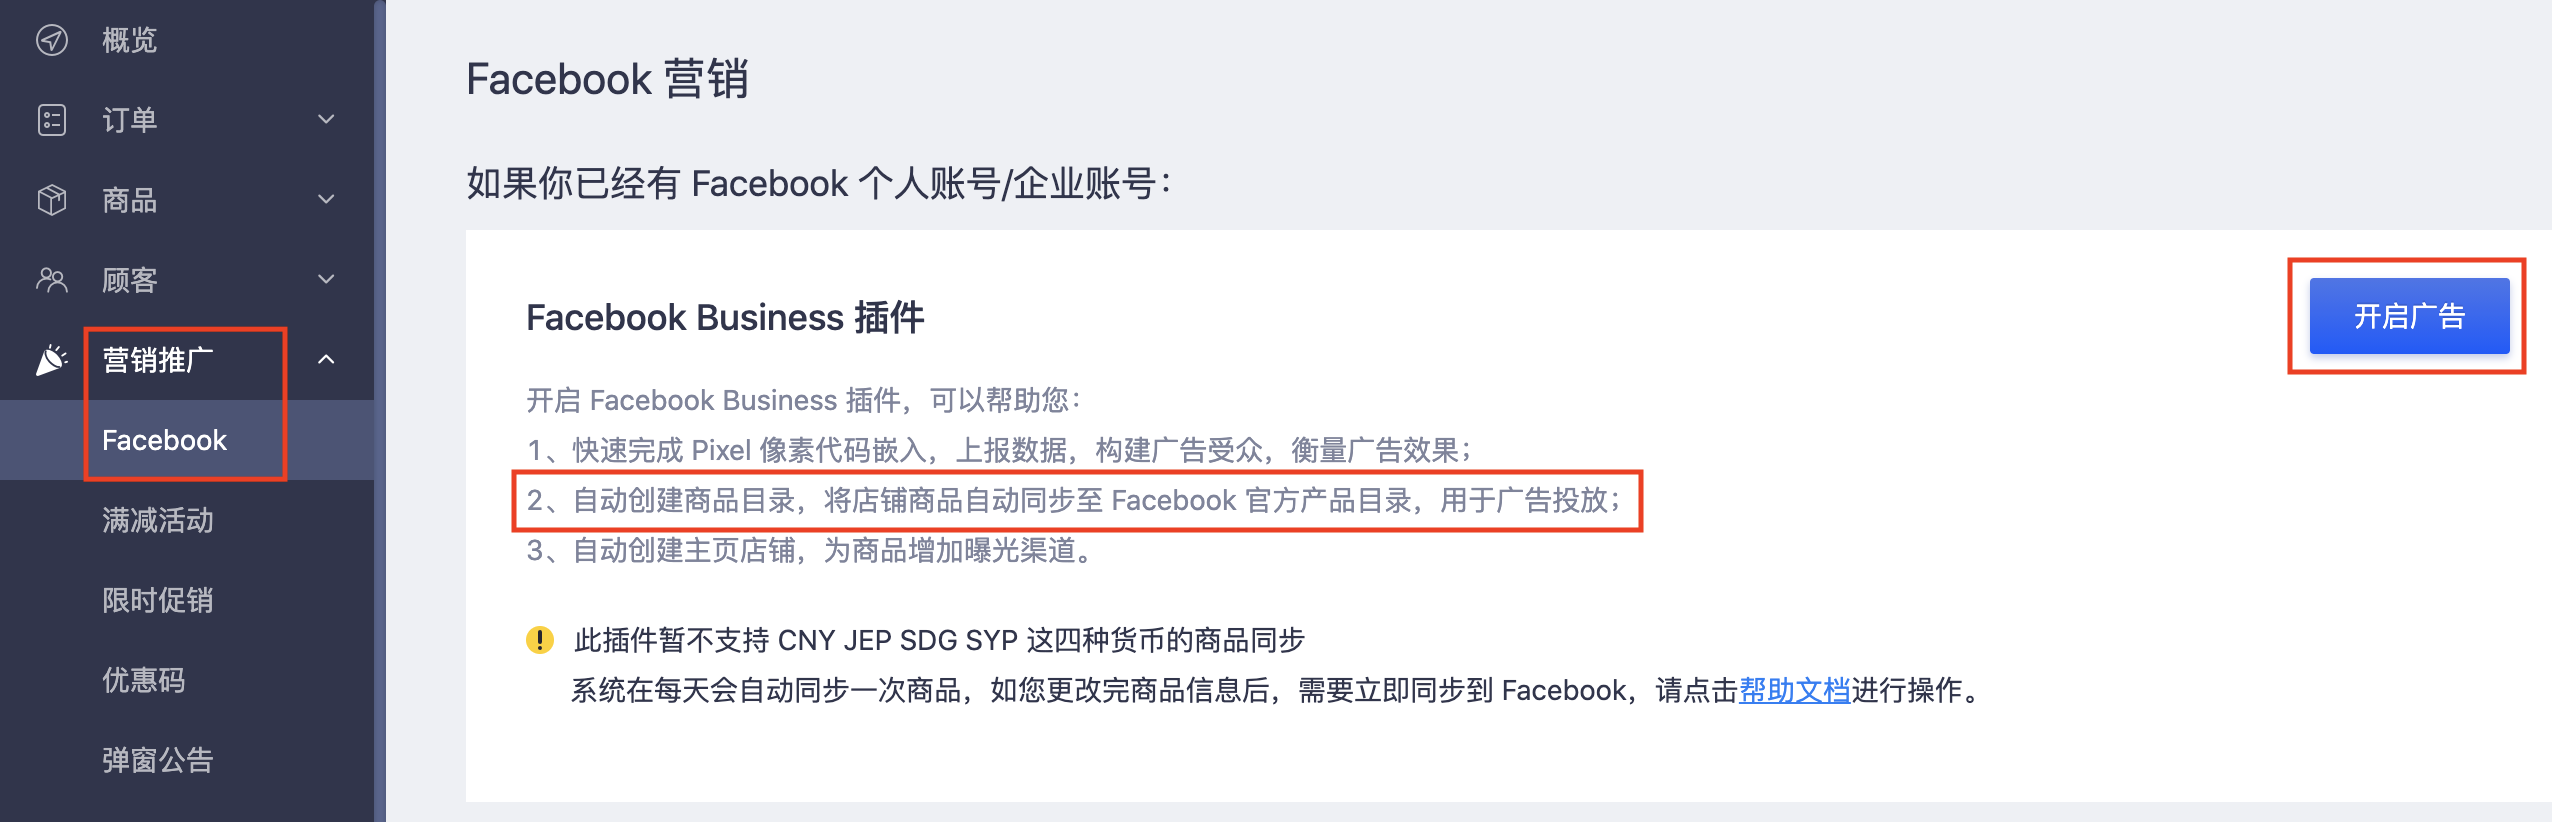 facebook独立站运营图解